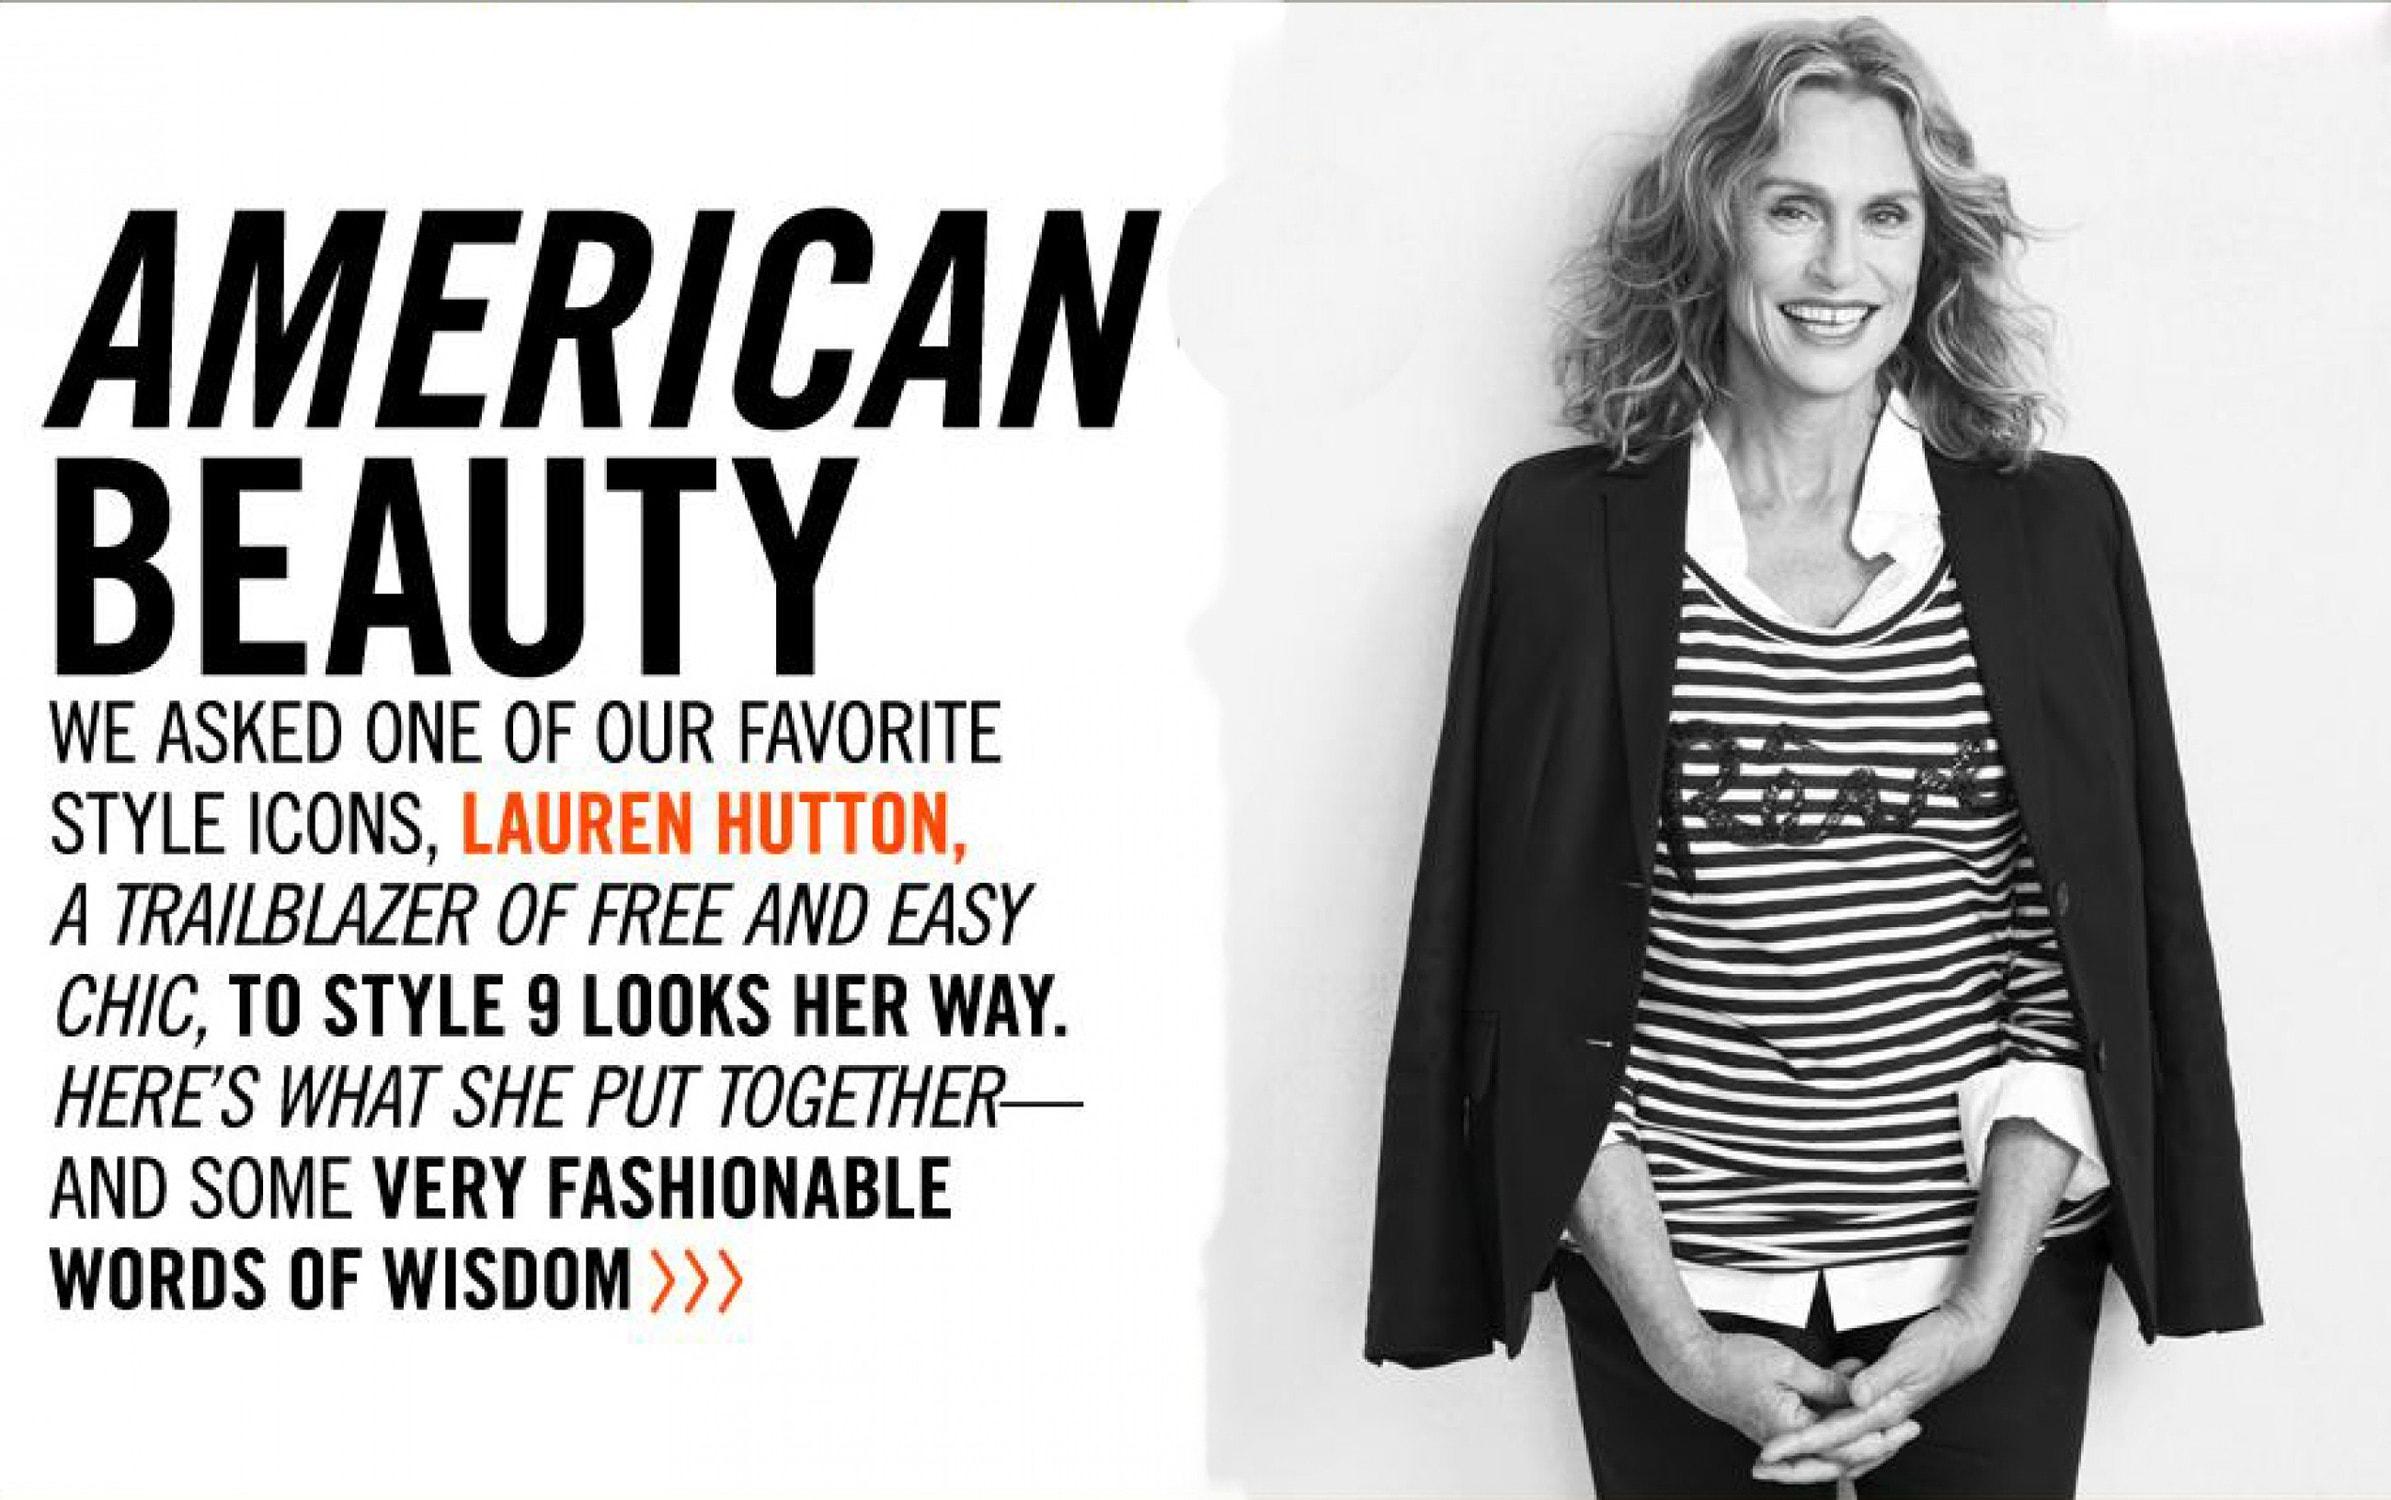 lauren hutton american beauty for j crew